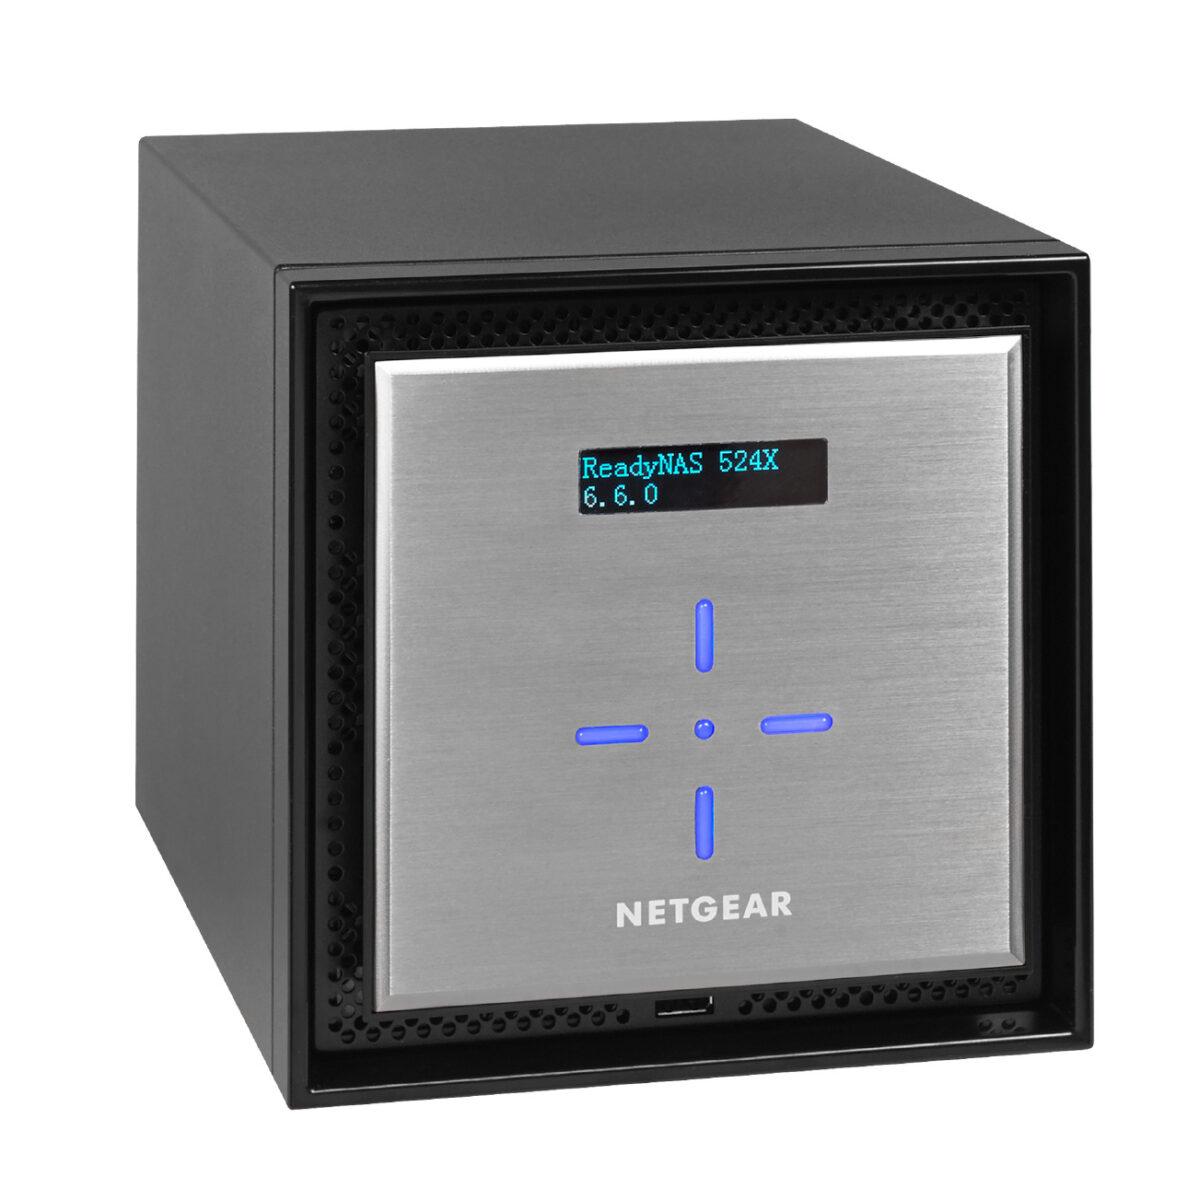 NETGEAR ReadyNAS 520